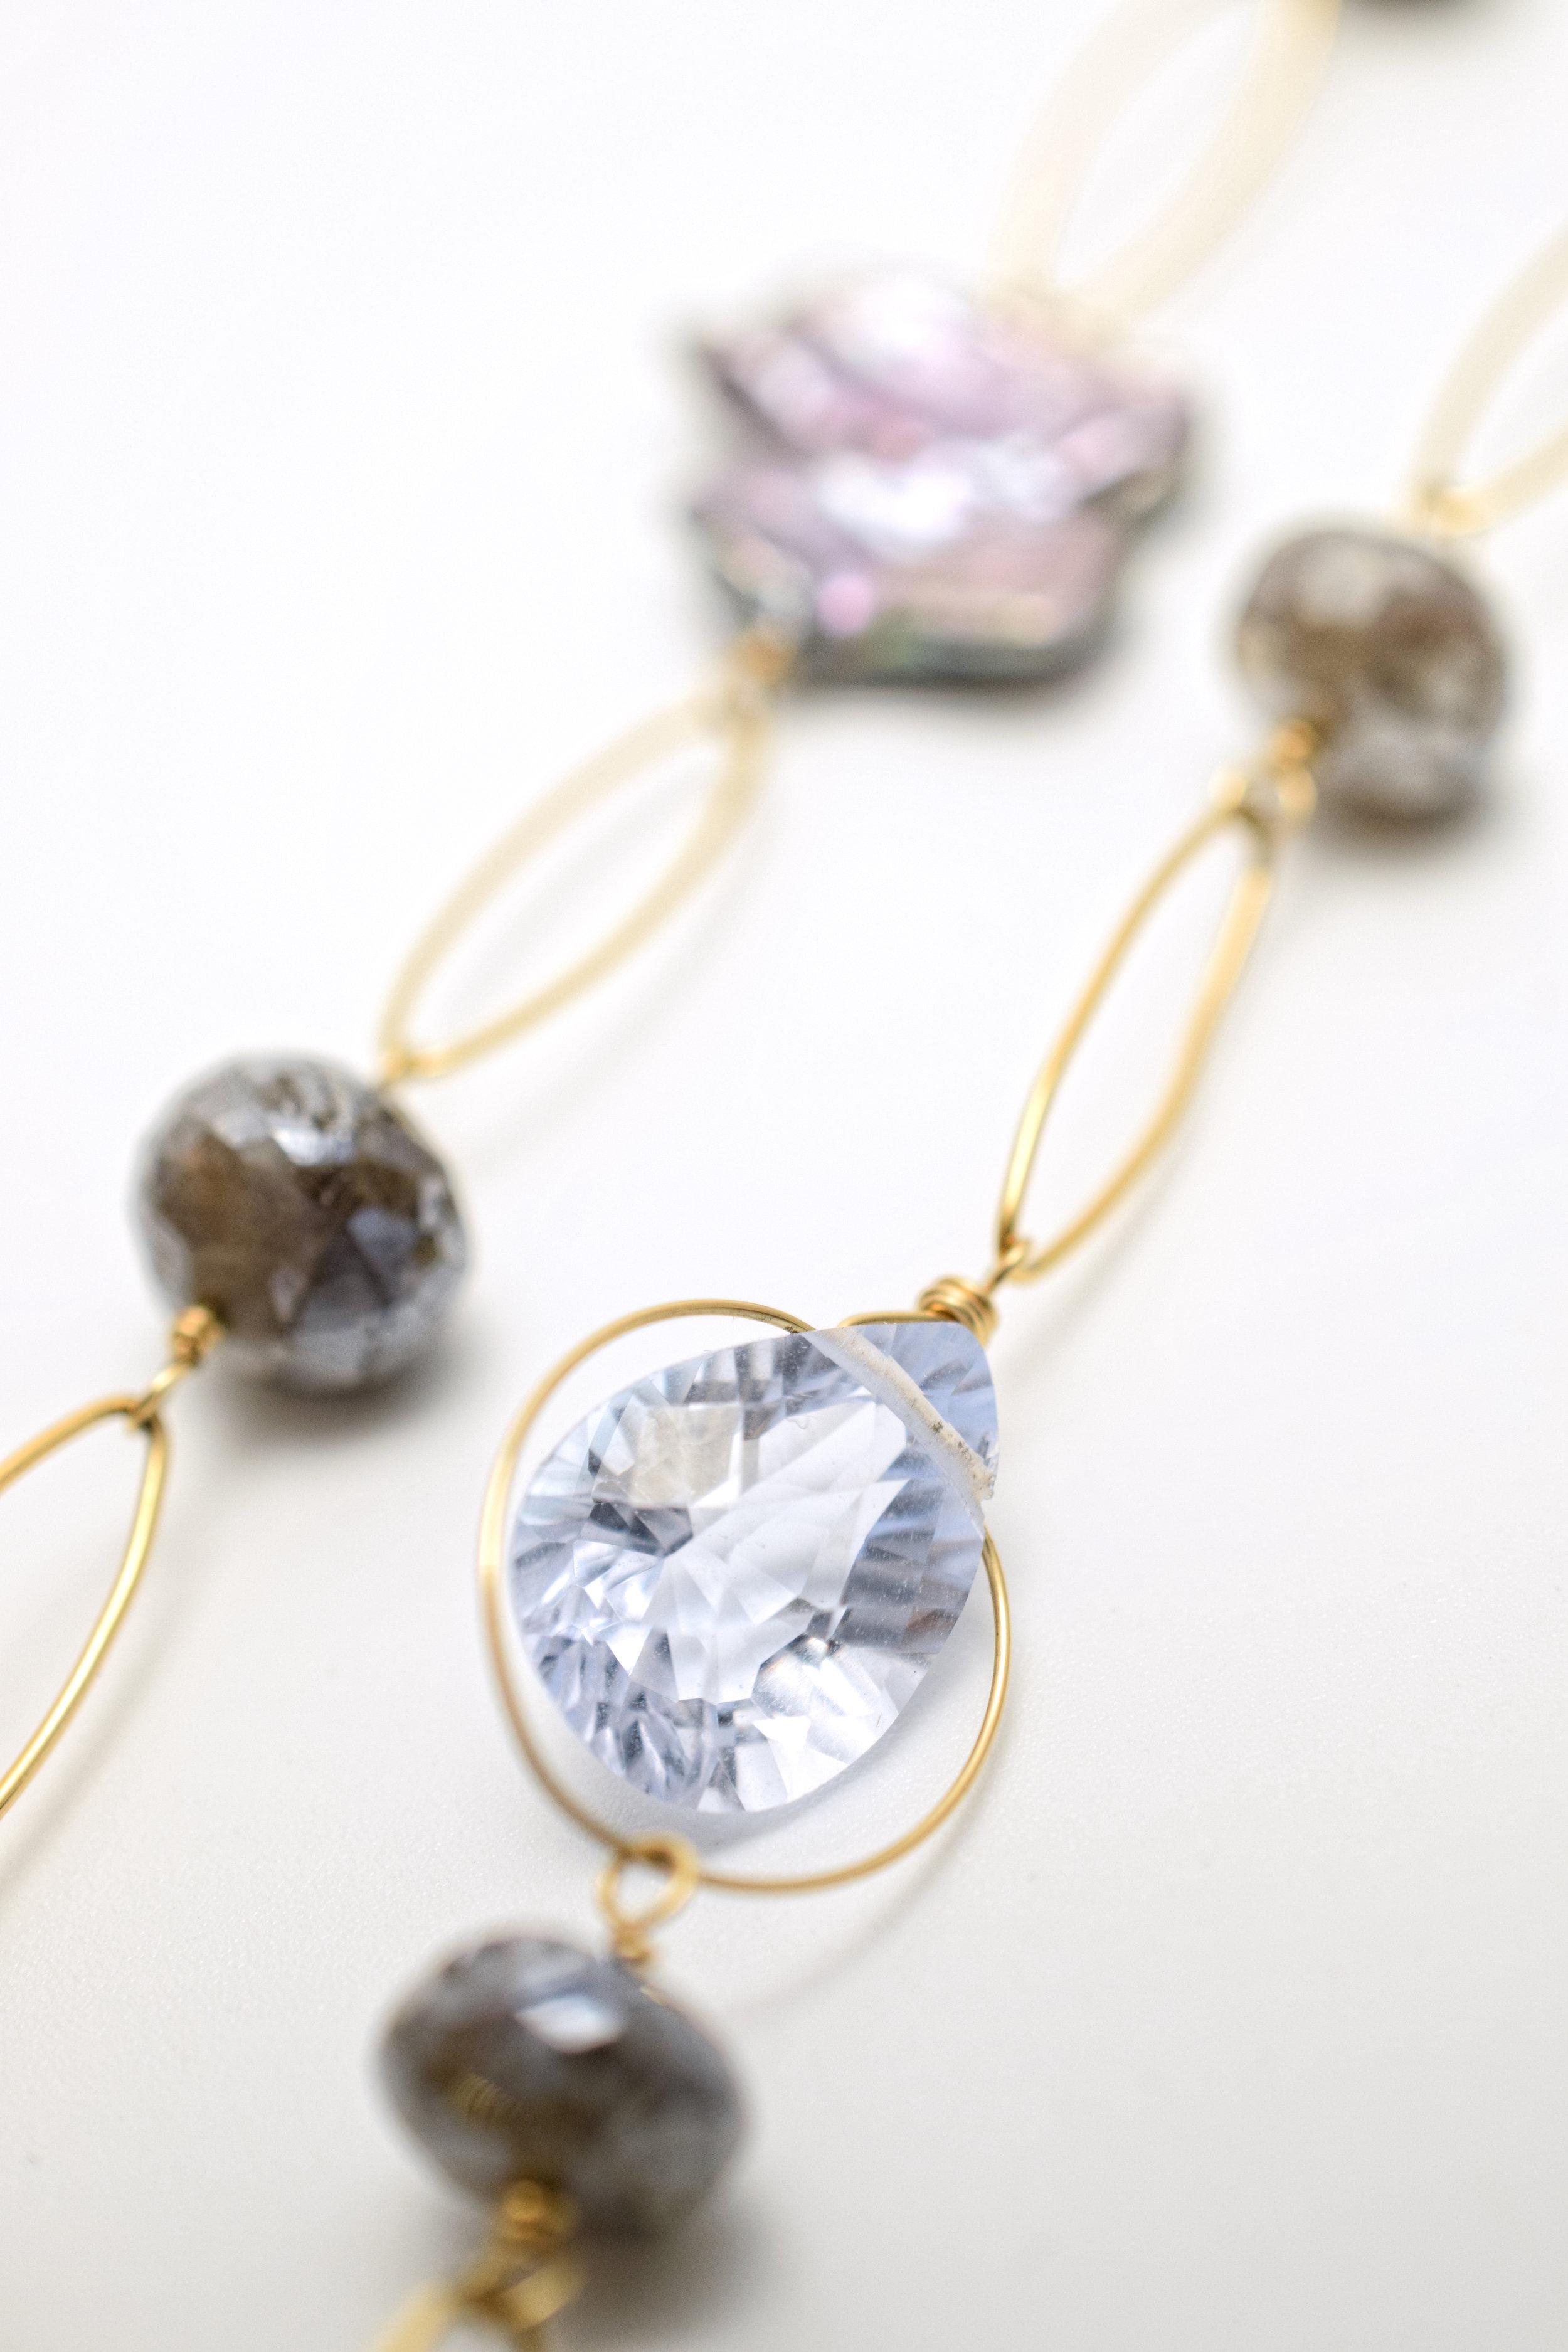 gemstone cluster pendant necklace